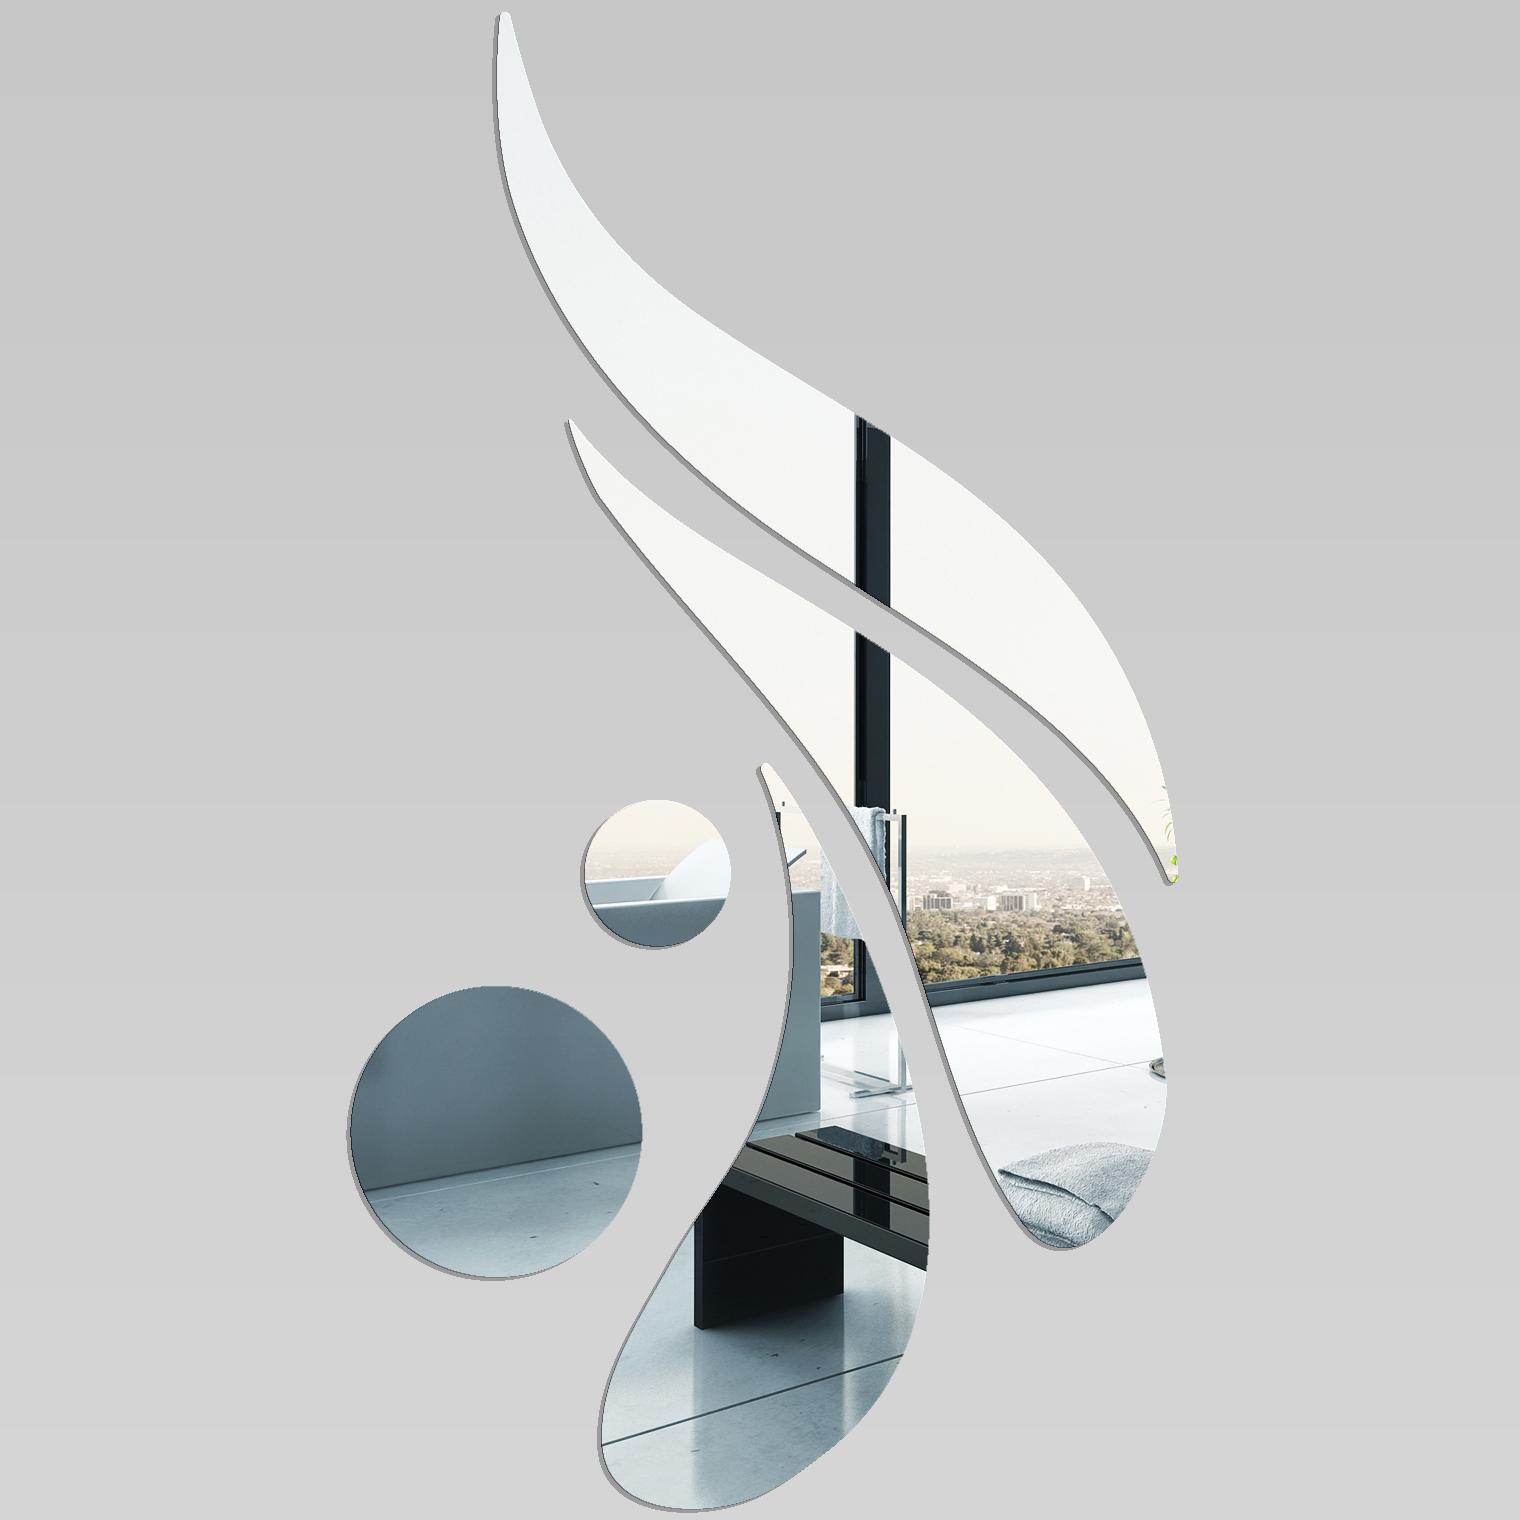 wandtattoos folies wandspiegel aus acrylglas design. Black Bedroom Furniture Sets. Home Design Ideas